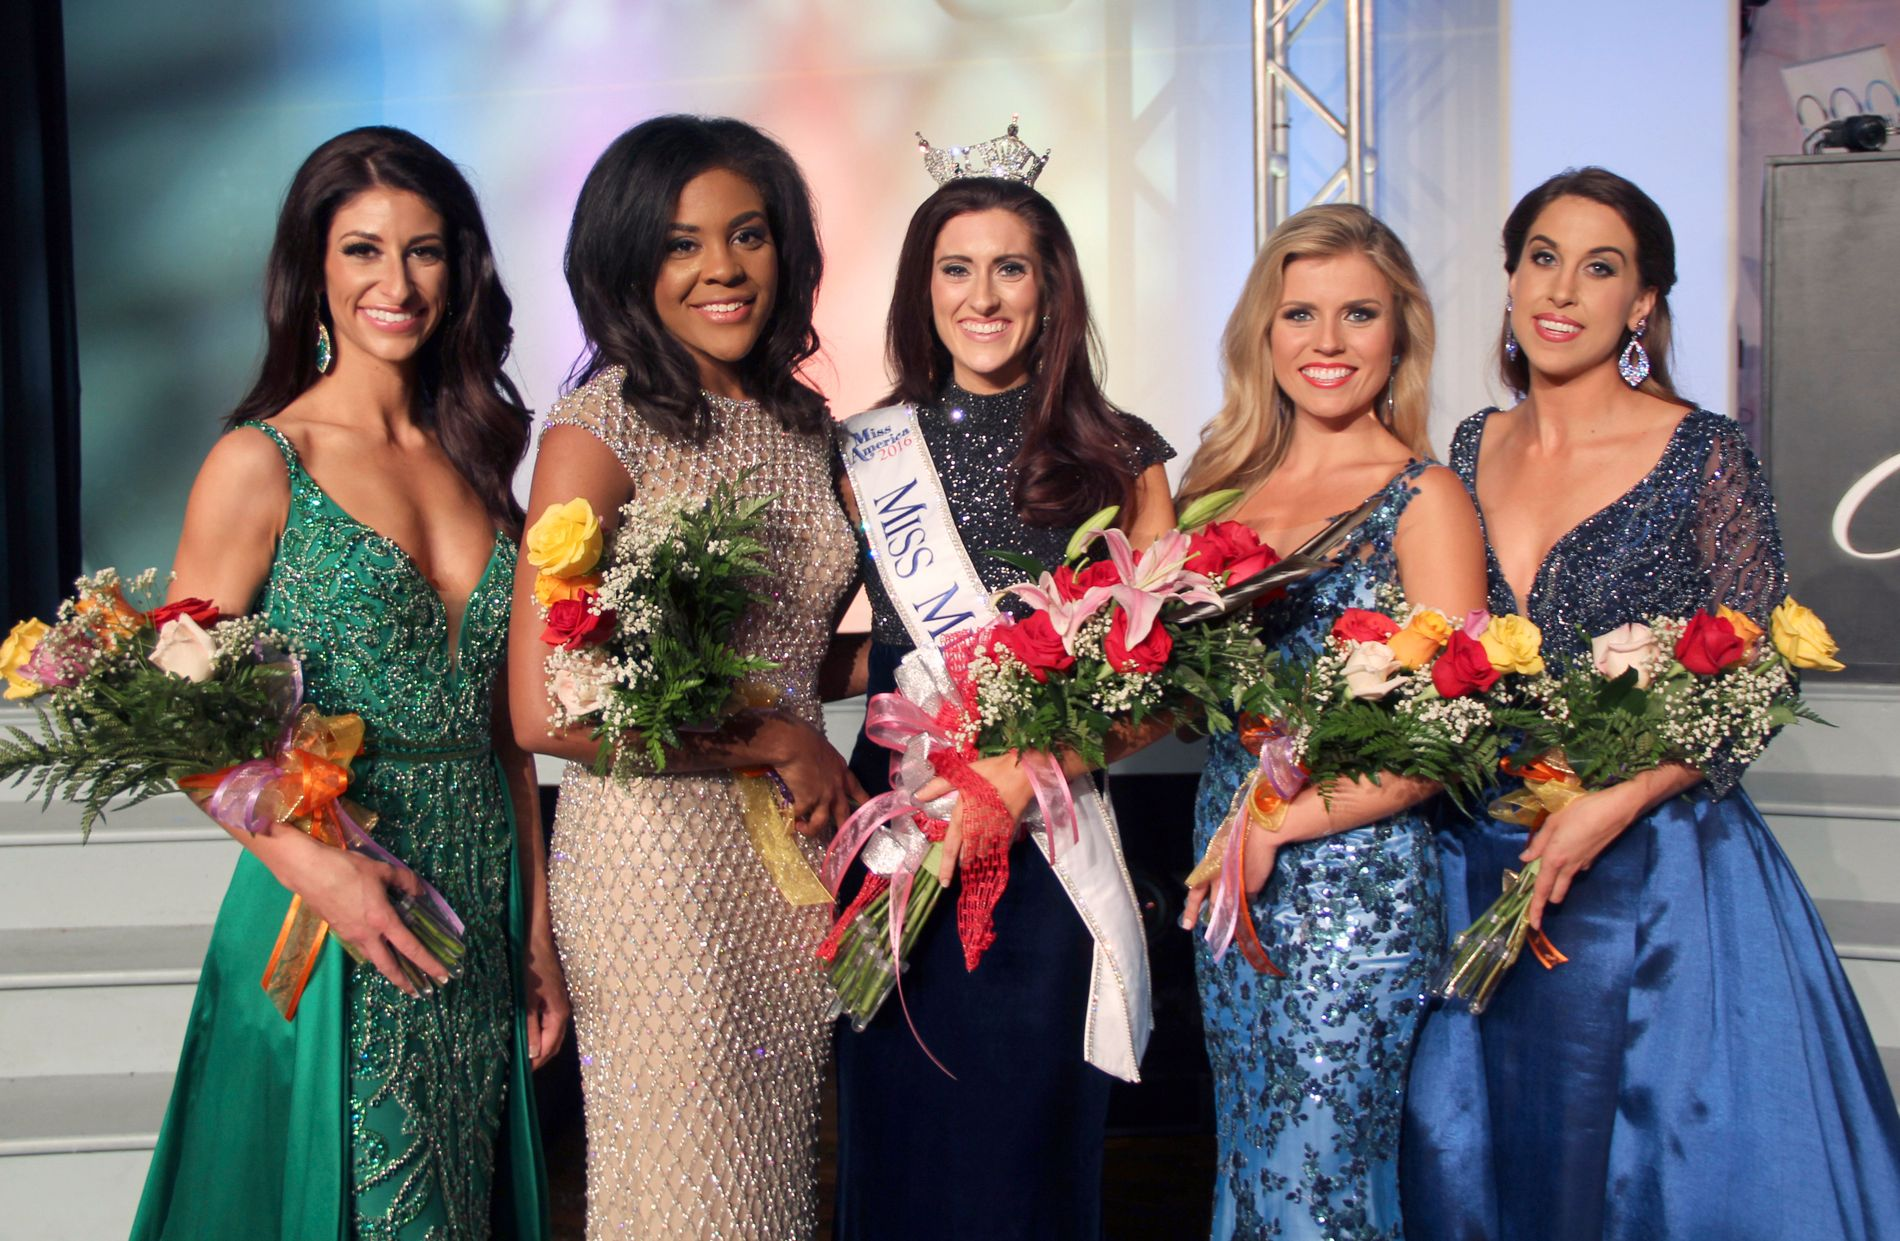 DELSTATSFINALISTENE: Miss Missouri 2016, Erin O'Flaherty, flankert med sine nærmeste konkurrenter under delstatsfinalen 18. juni.